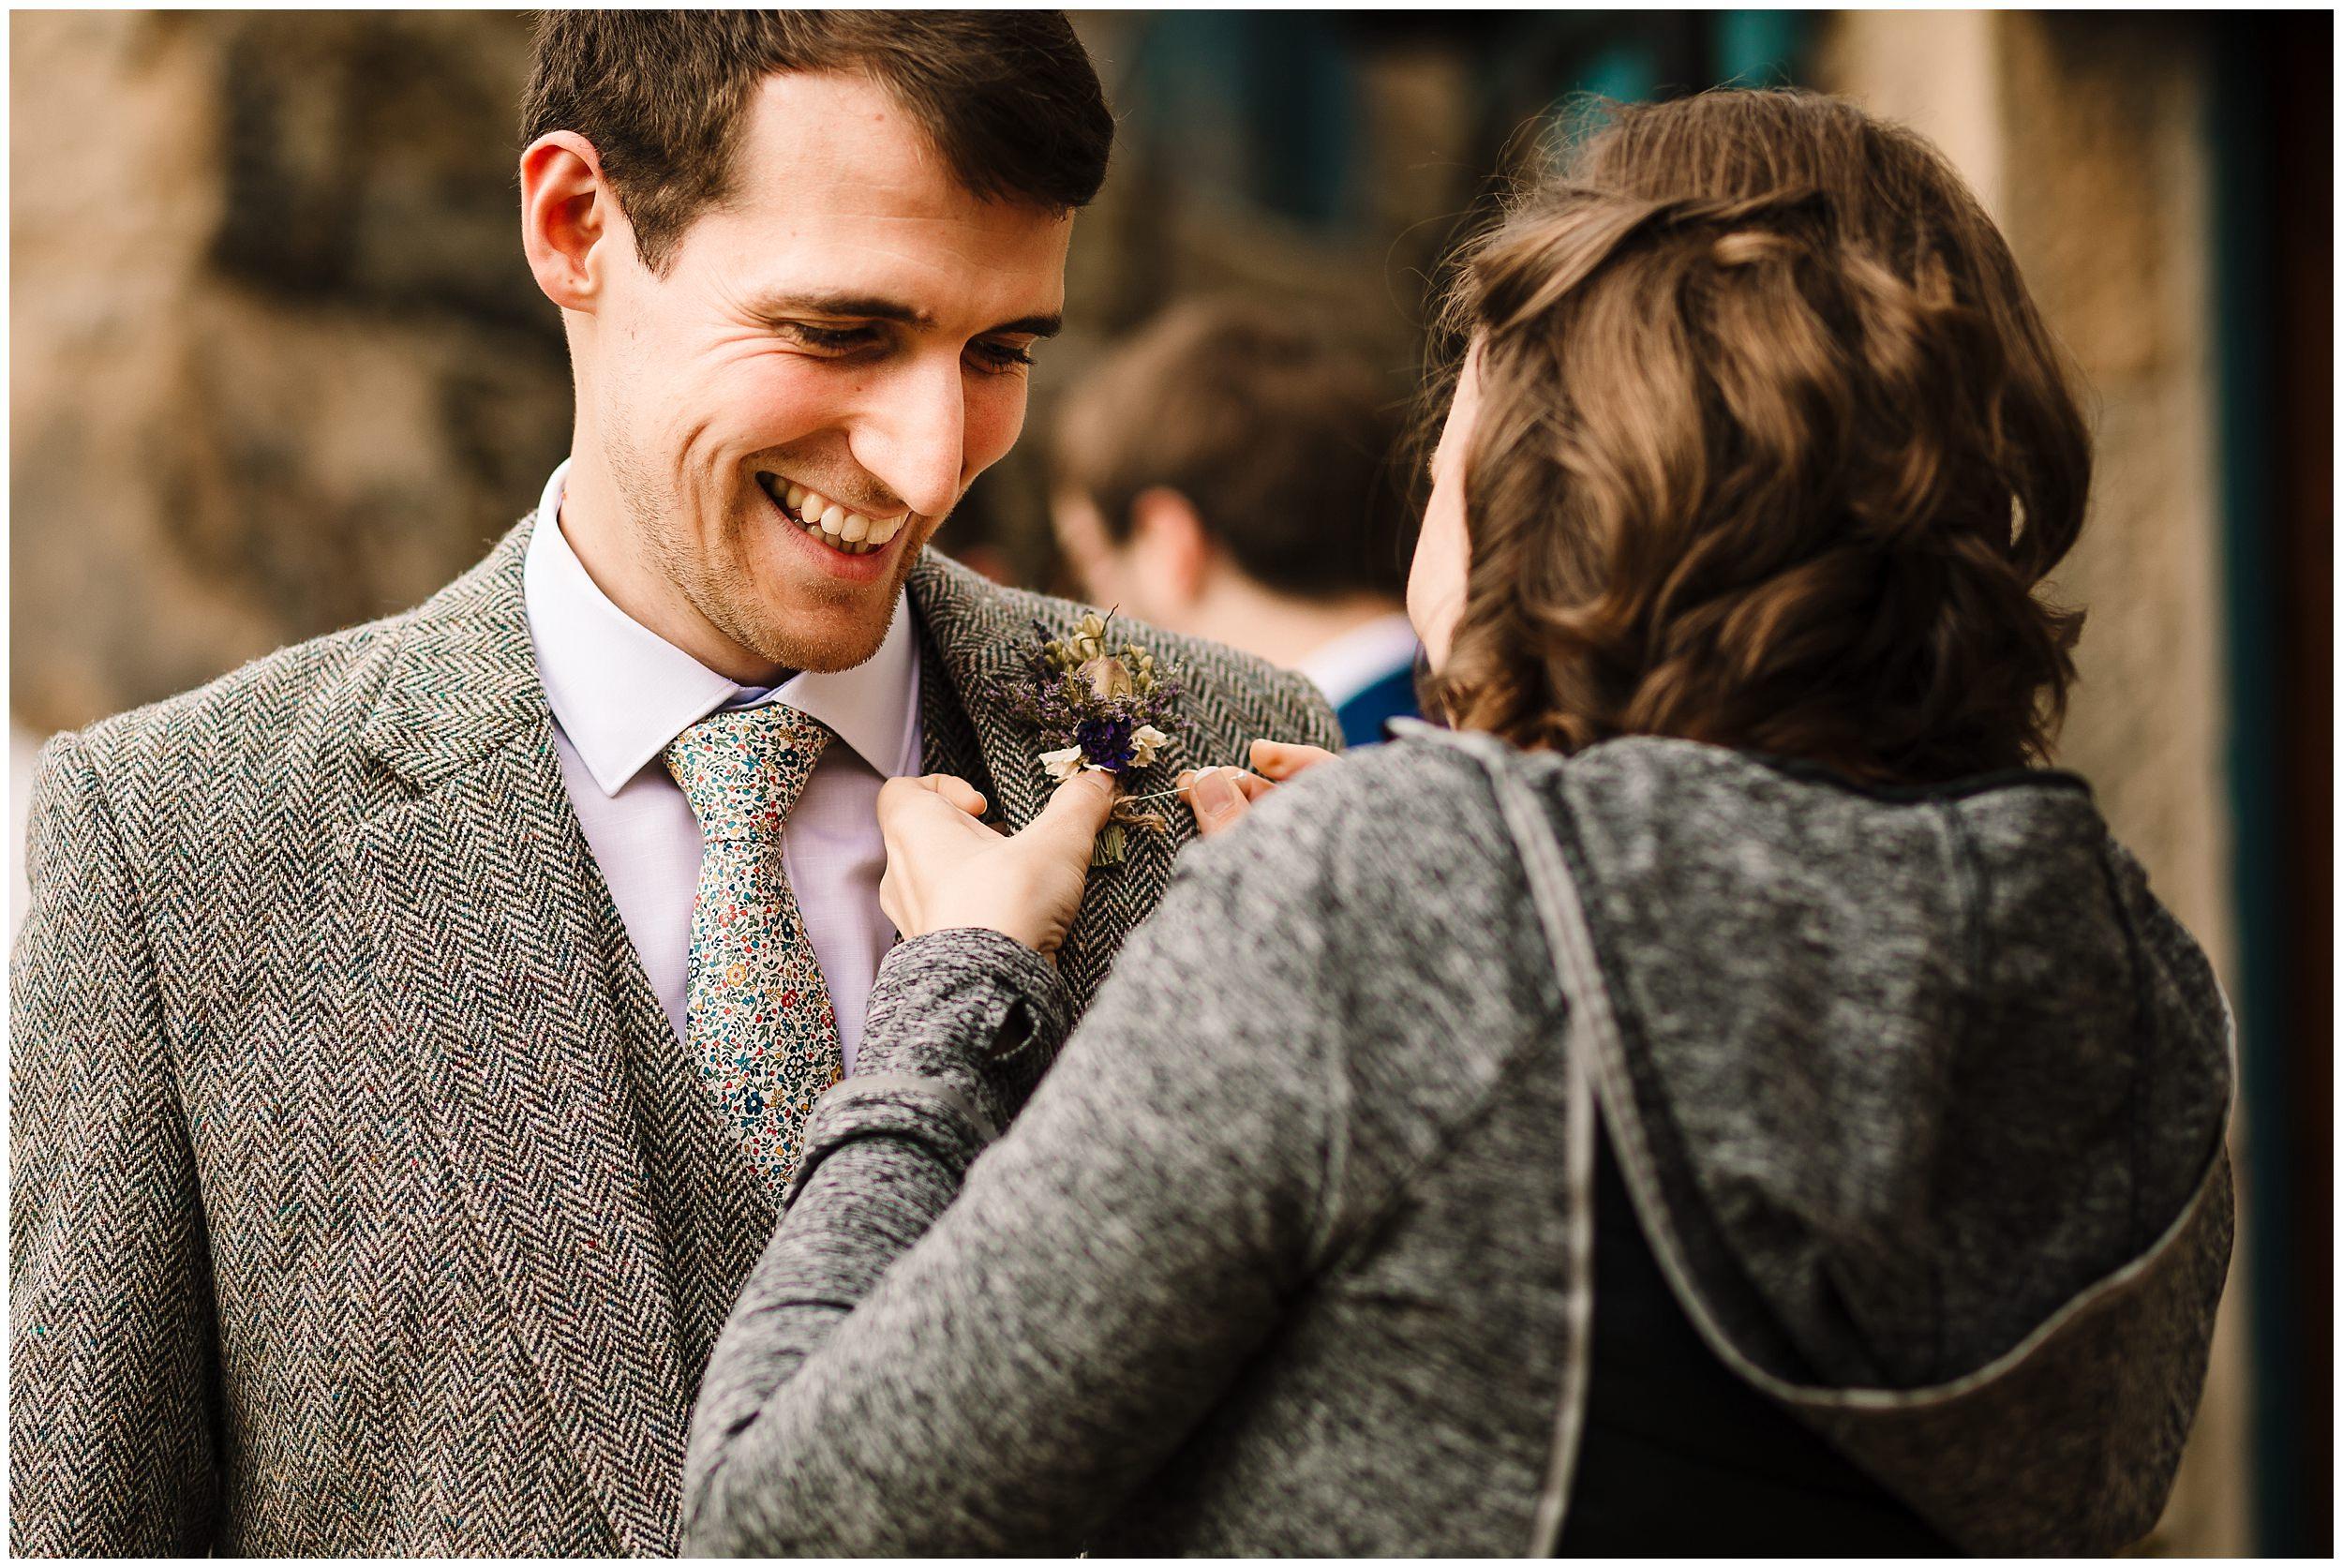 YORKSHIRE OUTDOOR WEDDING PHOTOGRAPHER LUCY ALEX_0008.jpg